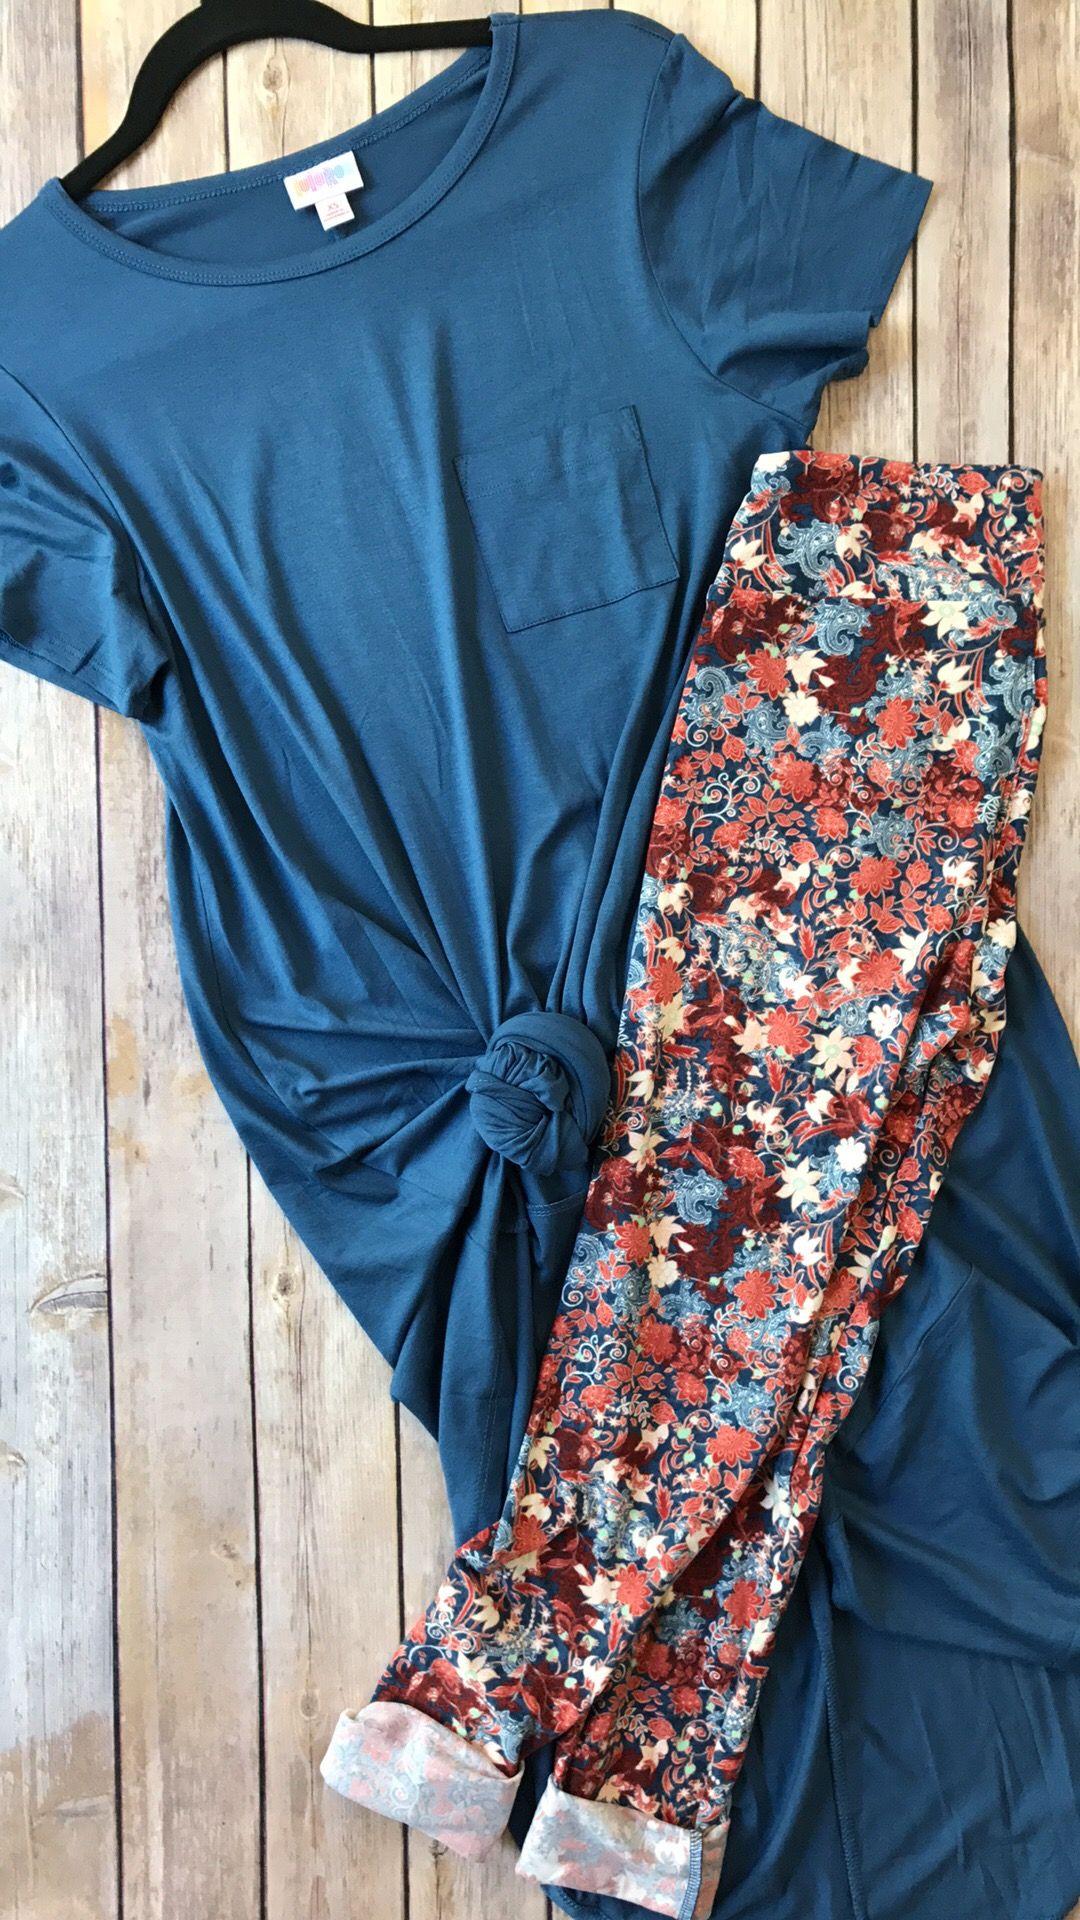 31a8ab5efb39e8 Find this Pin and more on LuLaRoe Tarin Nicole by MamaTarin. See more. Turn  your LuLaRoe Nicole into a sleeveless dress.  TrinityLuLaRoe   LuLaRoeJaimeThomas